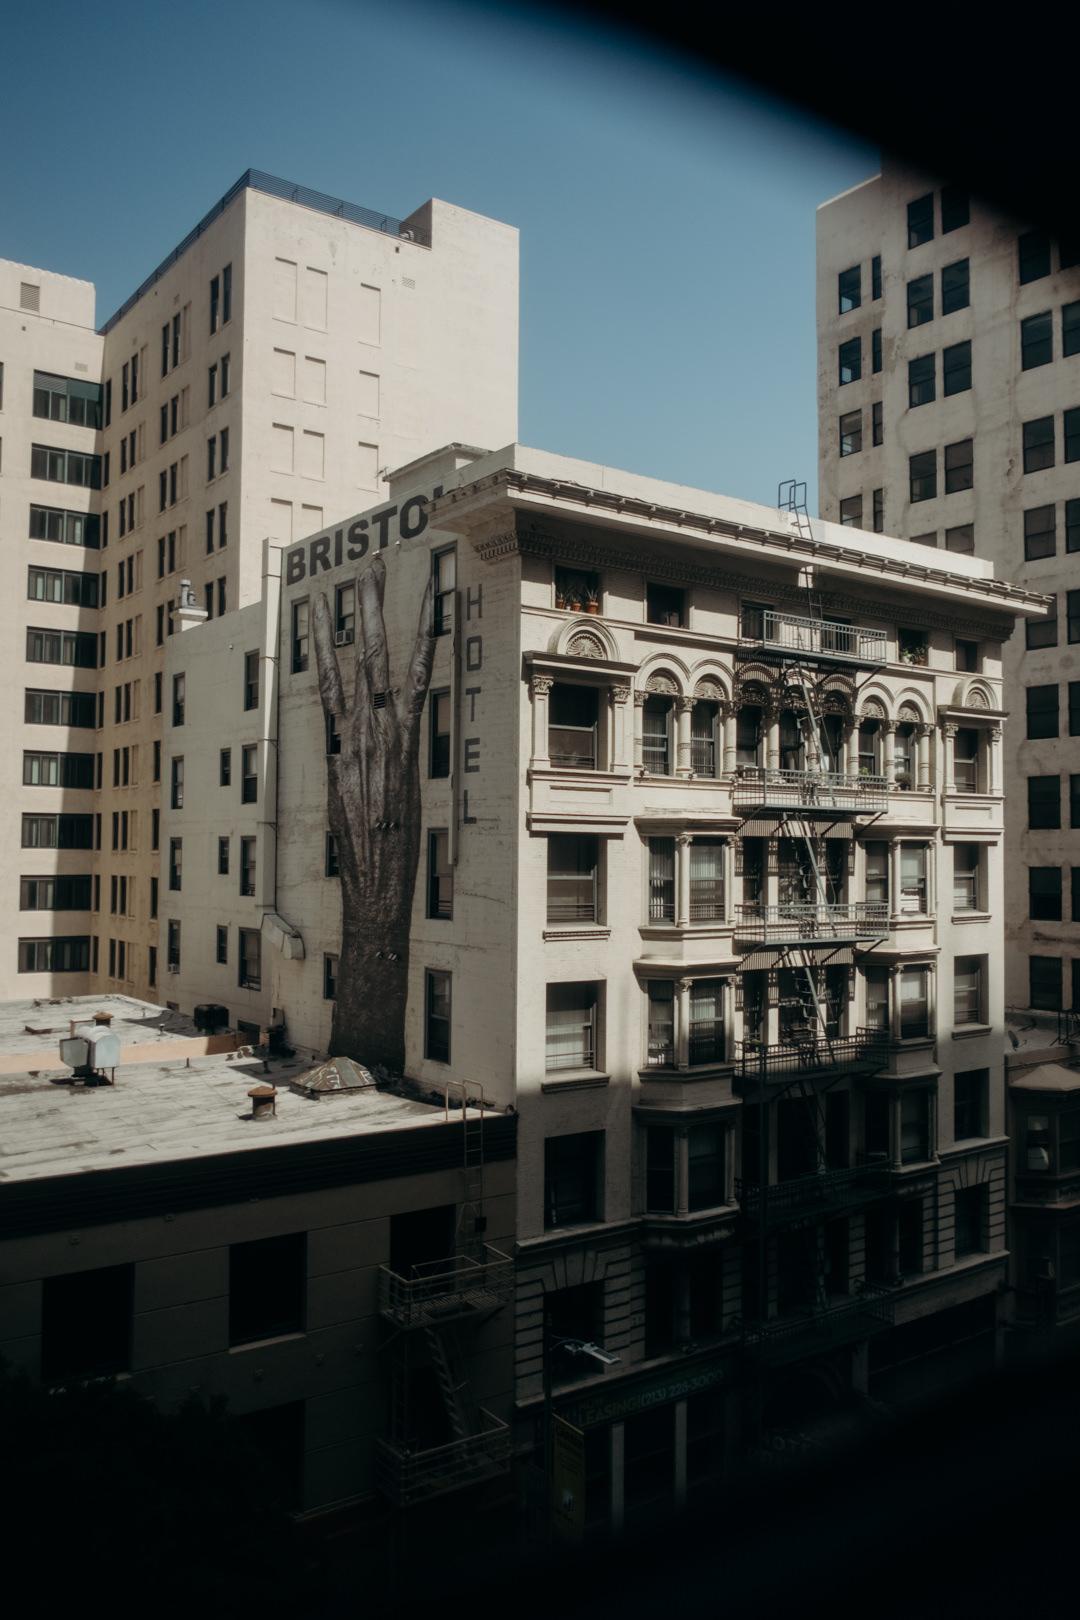 20180404_Freehand Los Angeles - Best Hotel DTLA_9.jpg